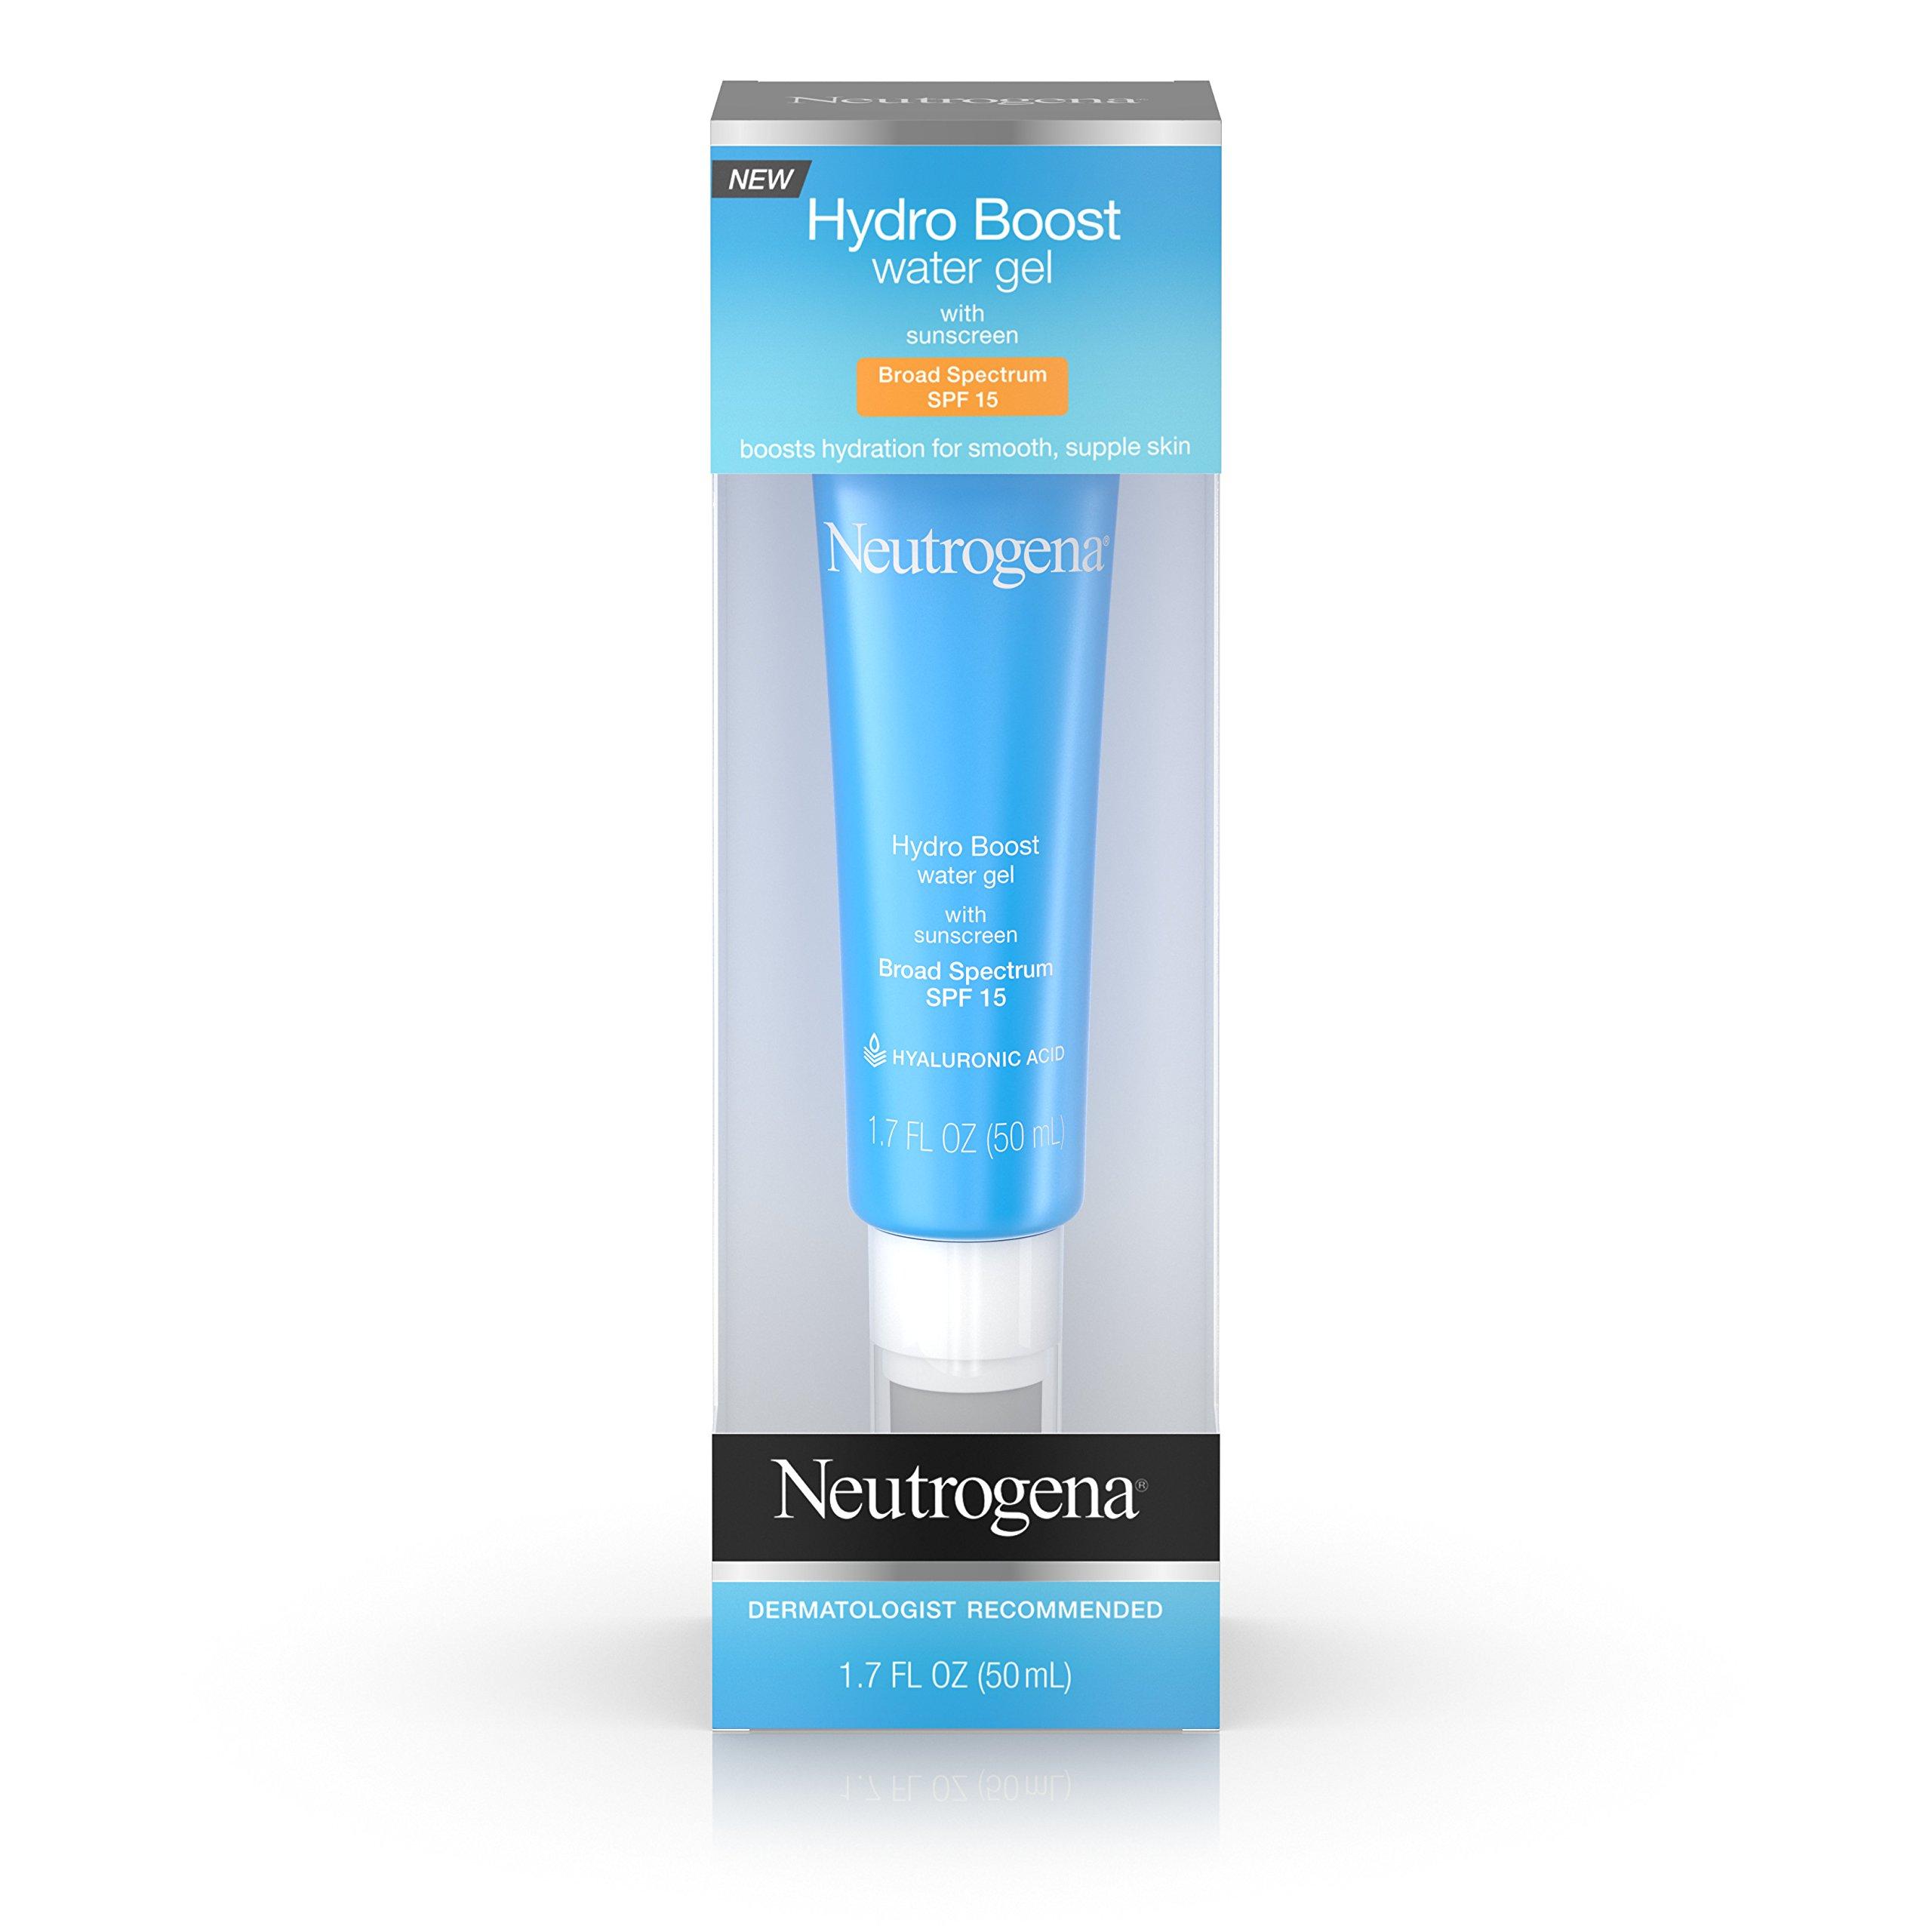 Neutrogena Hydro Boost Water Gel SPF 15, 1.7 Oz